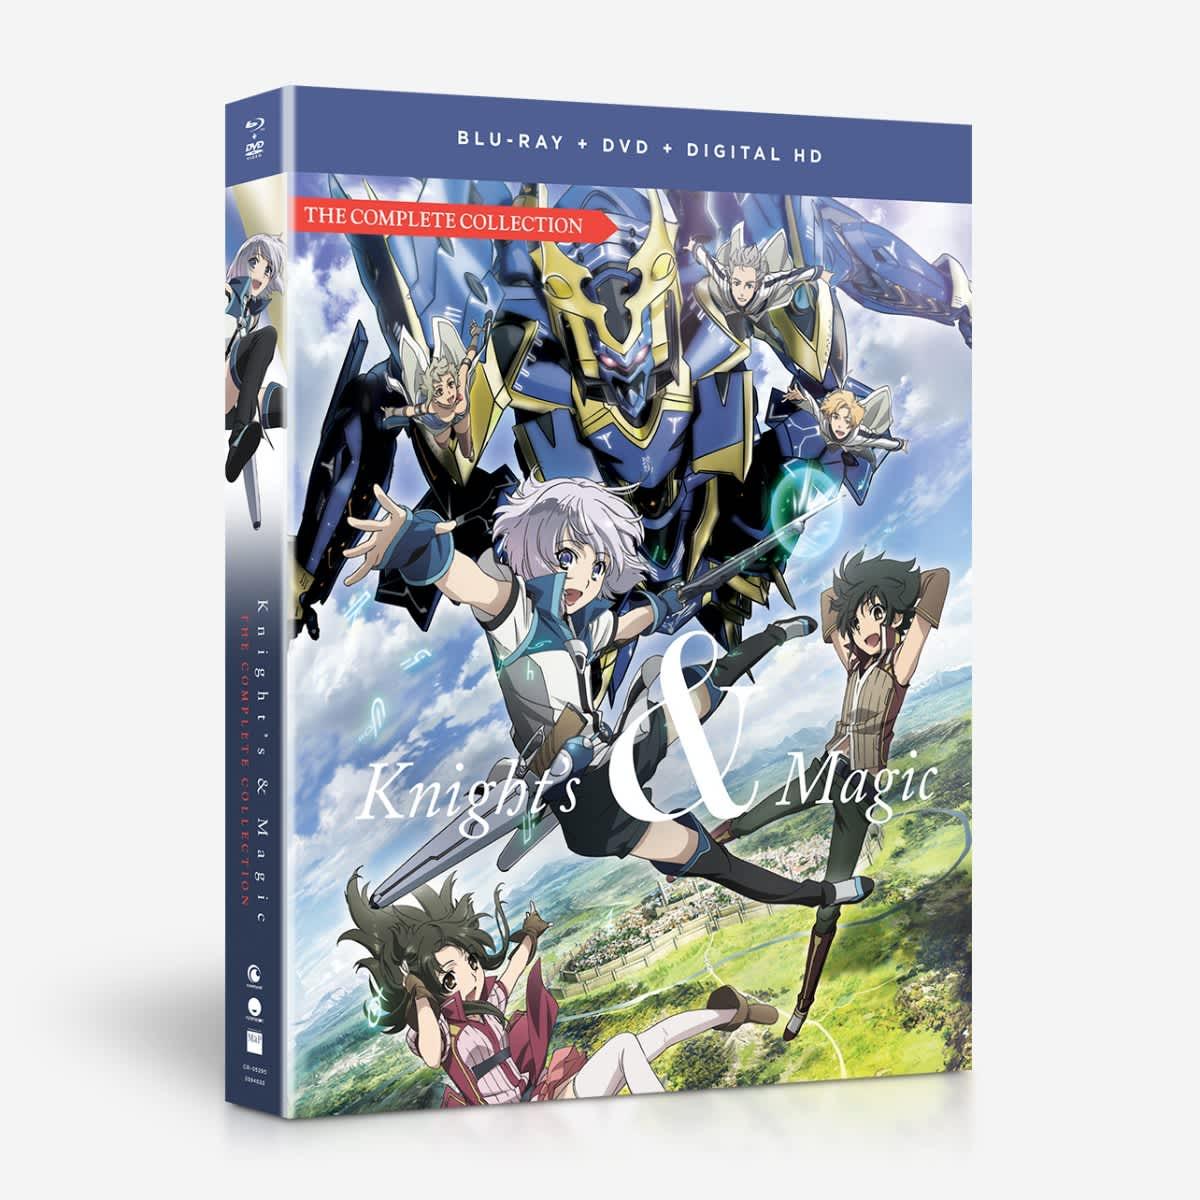 Knight's & Magic Blu-ray/DVD 704400052958